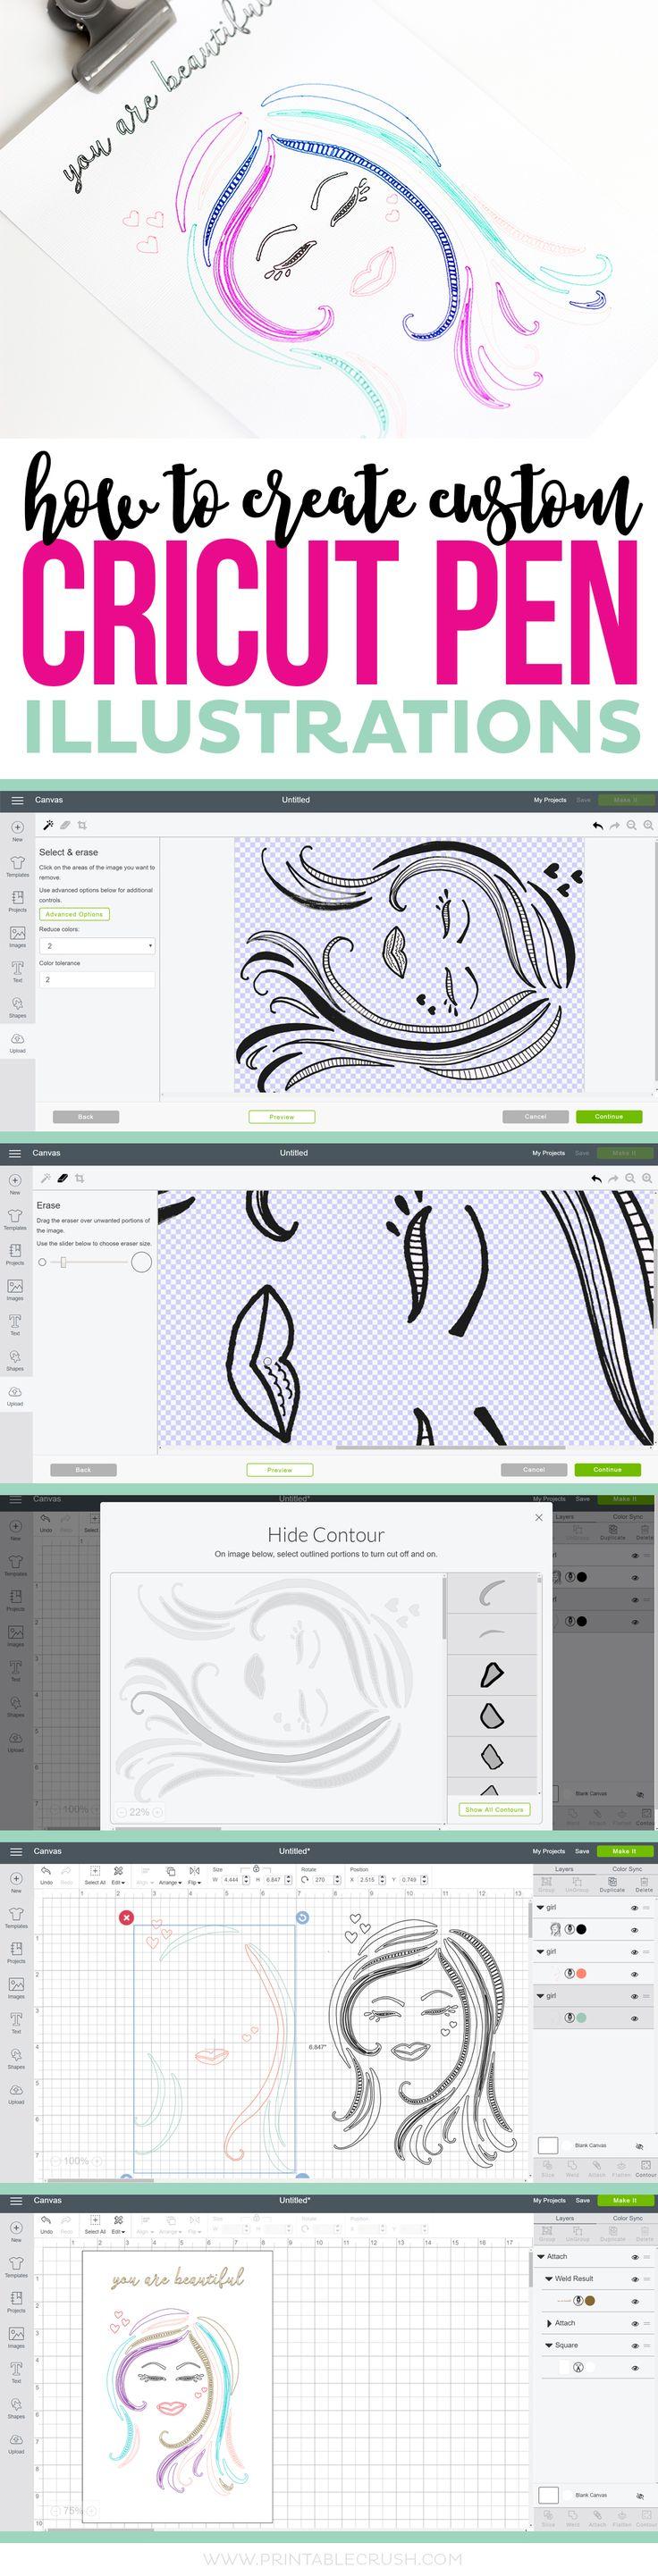 How to Create Custom Cricut Pen Illustrations - Printable Crush